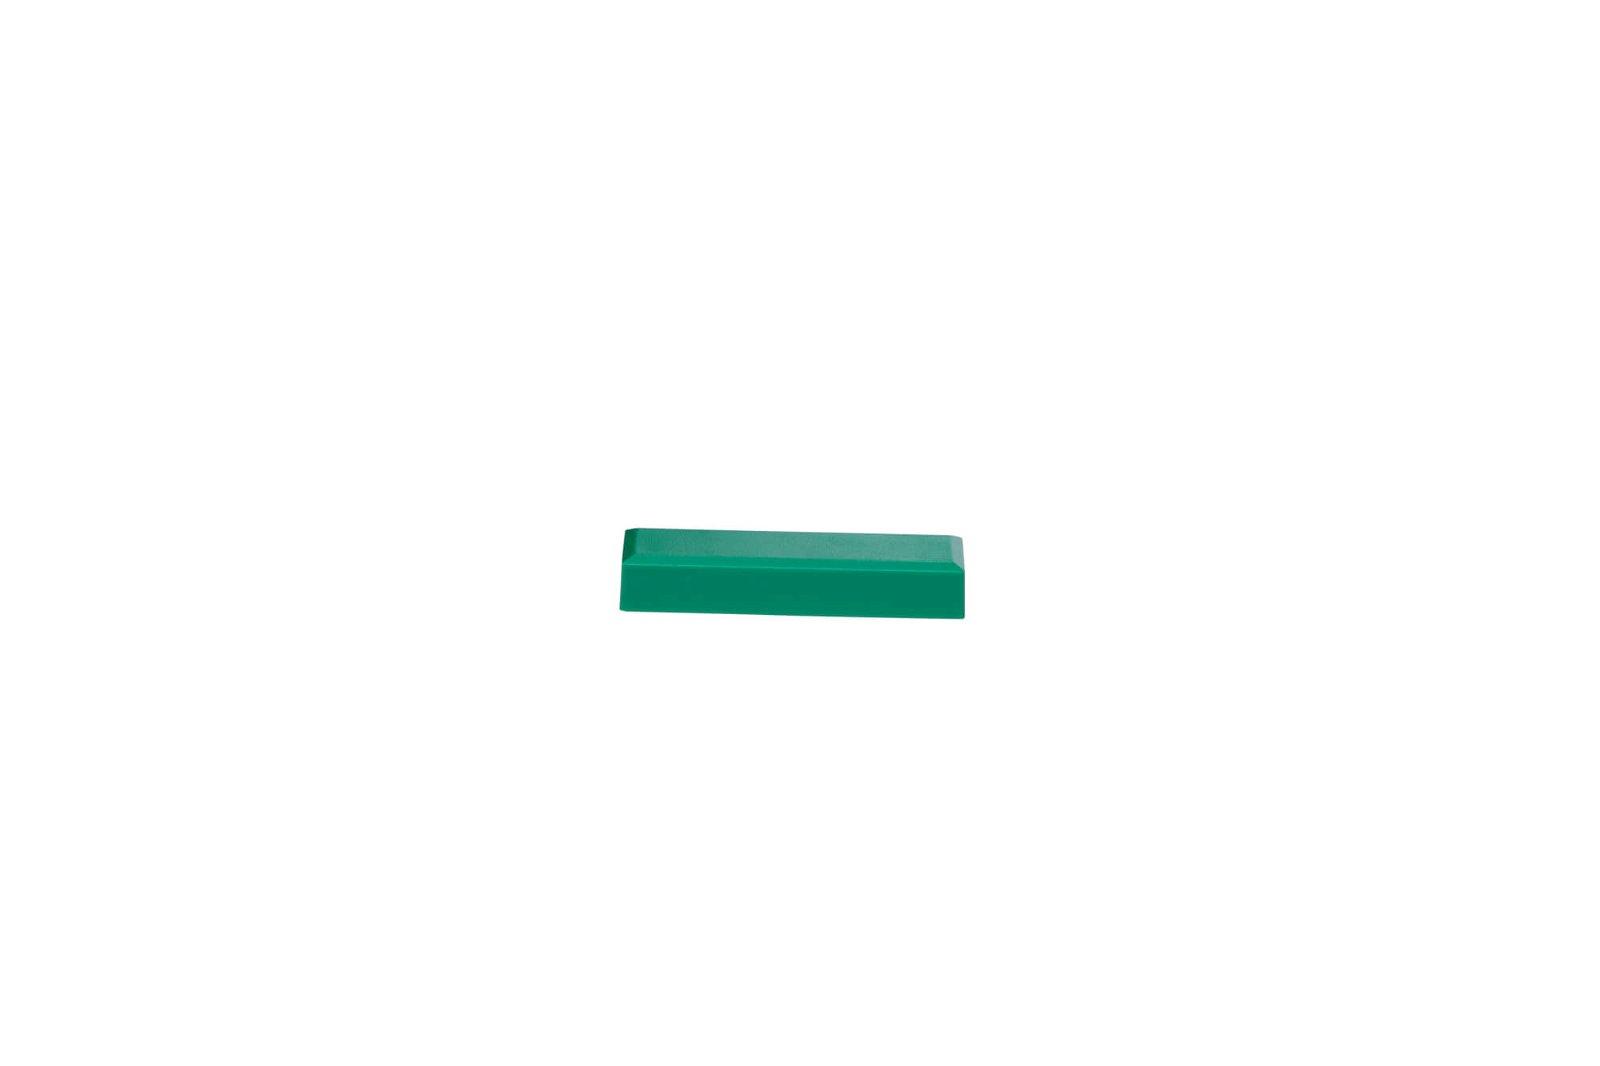 Facetterand-Magnet MAULpro 53 x 18 mm, 1 kg, 20 St./Set, grün